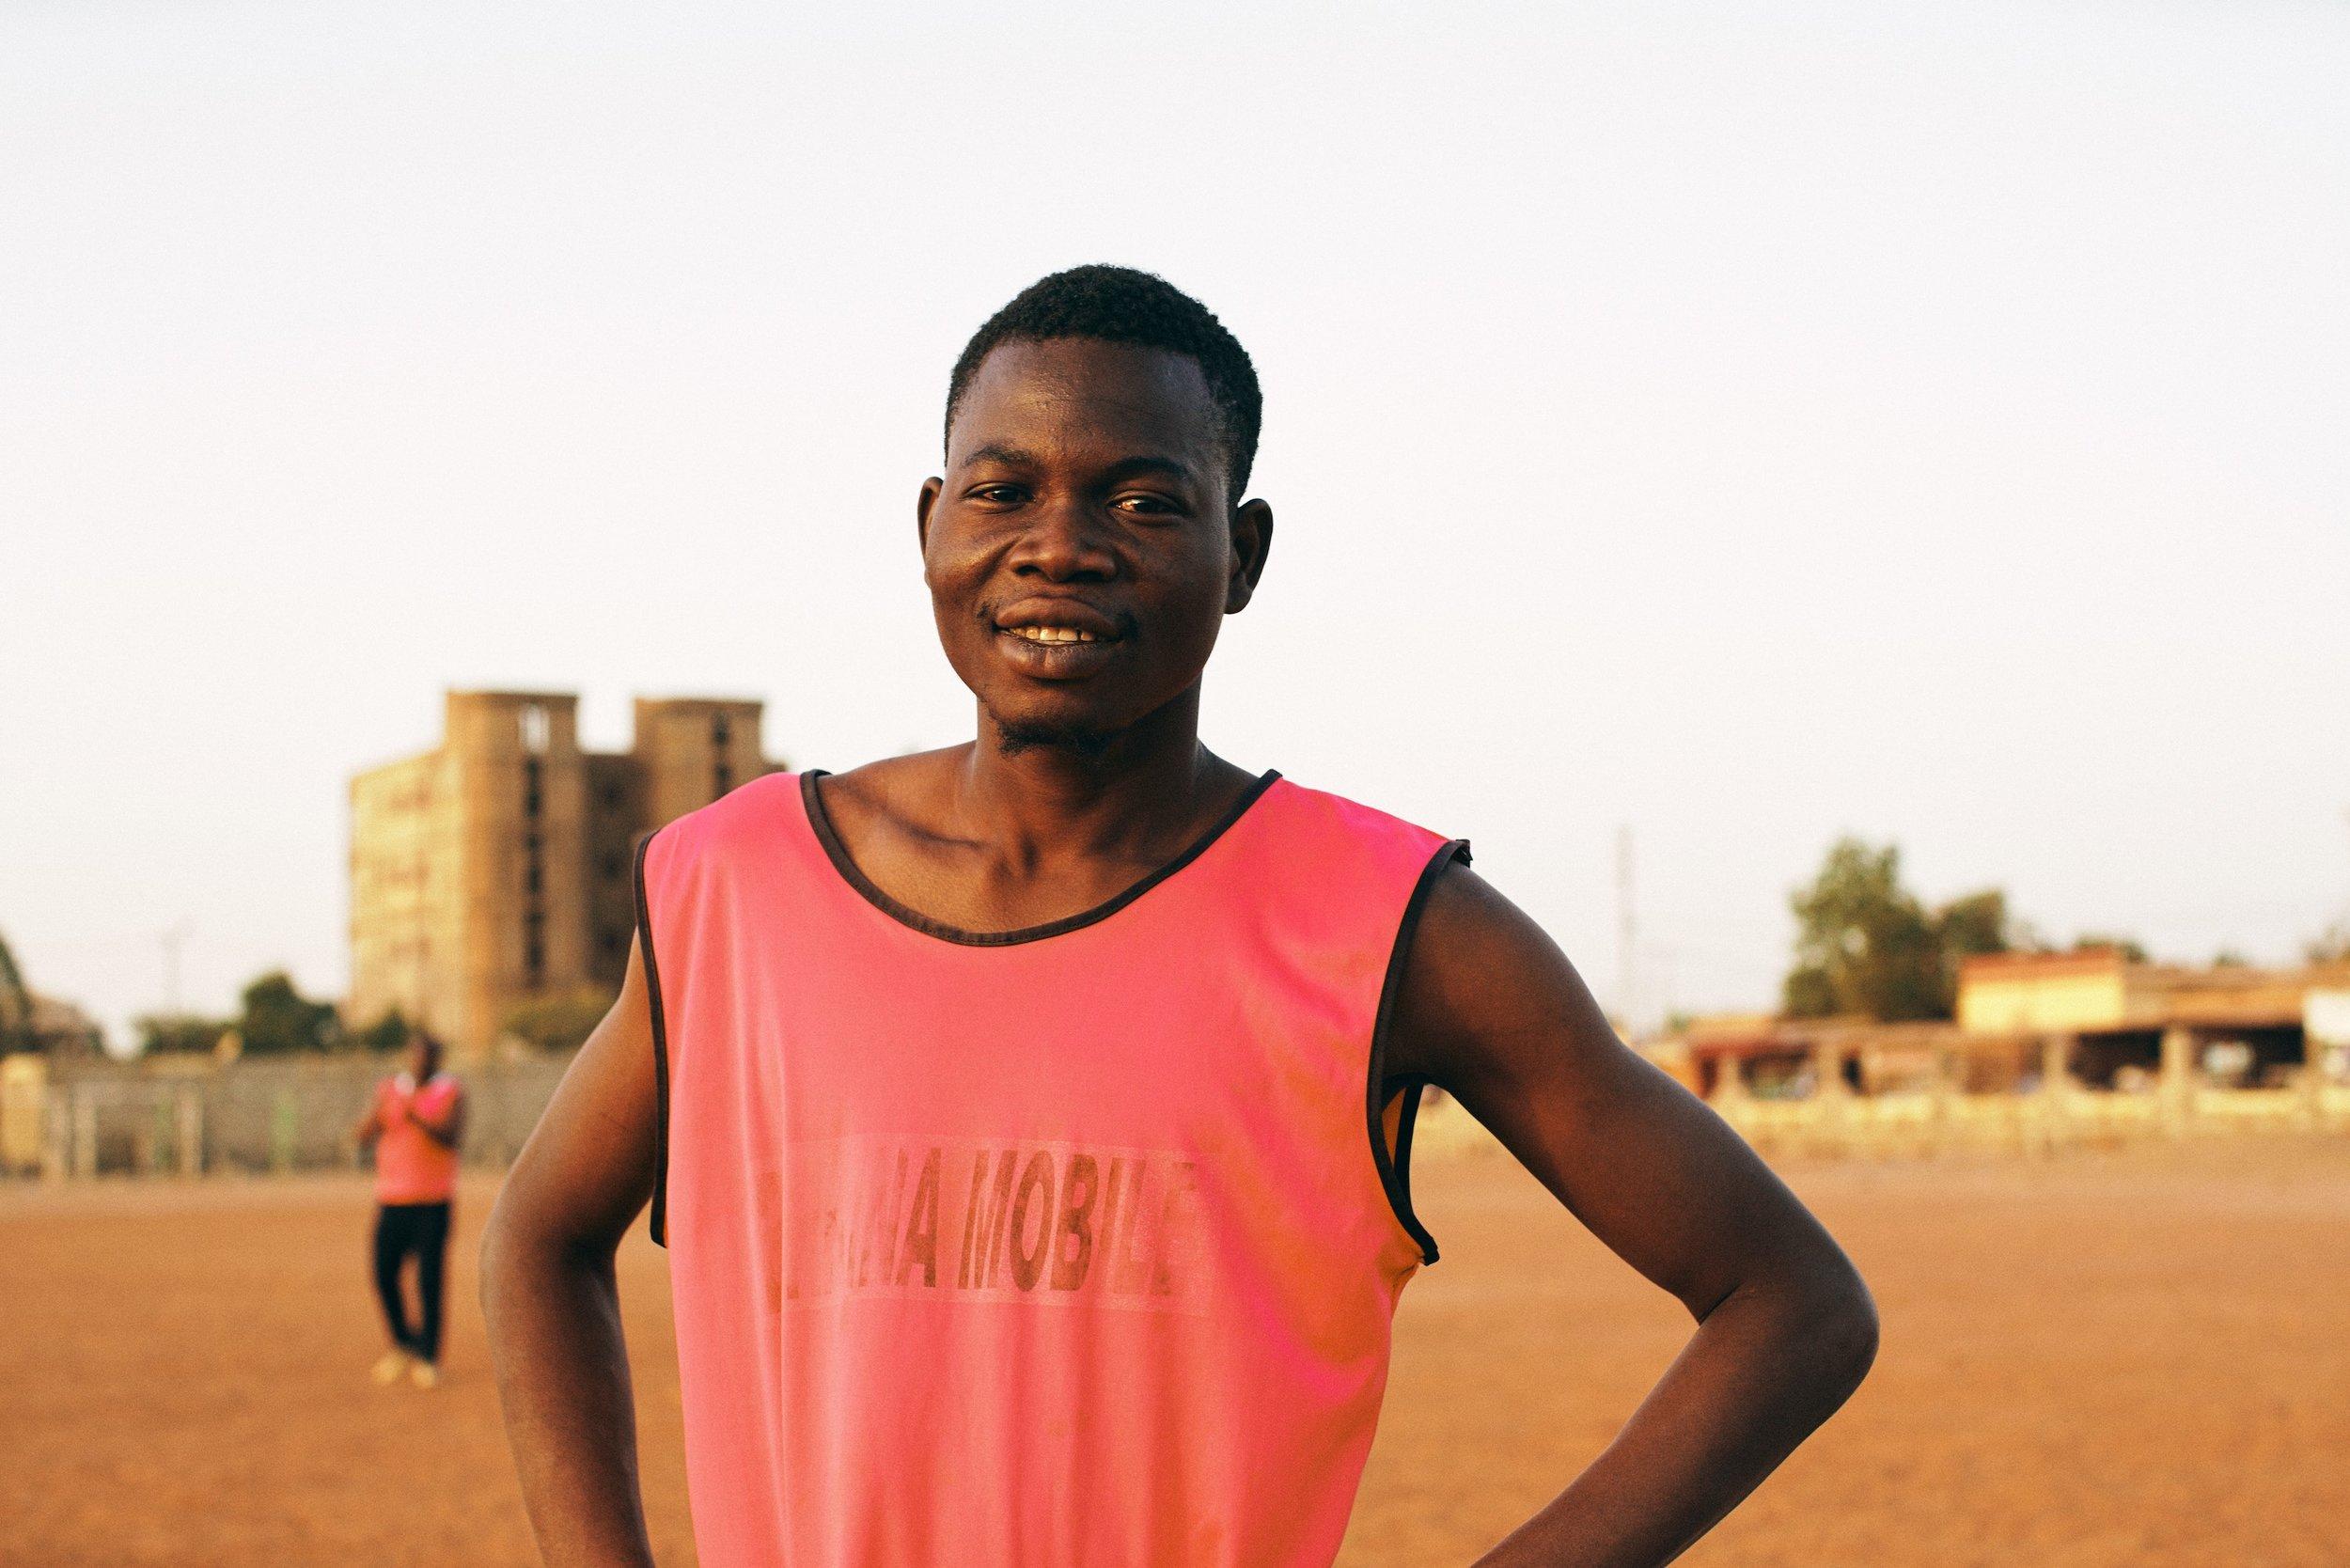 Stockdale_Ouagadougou66.jpg